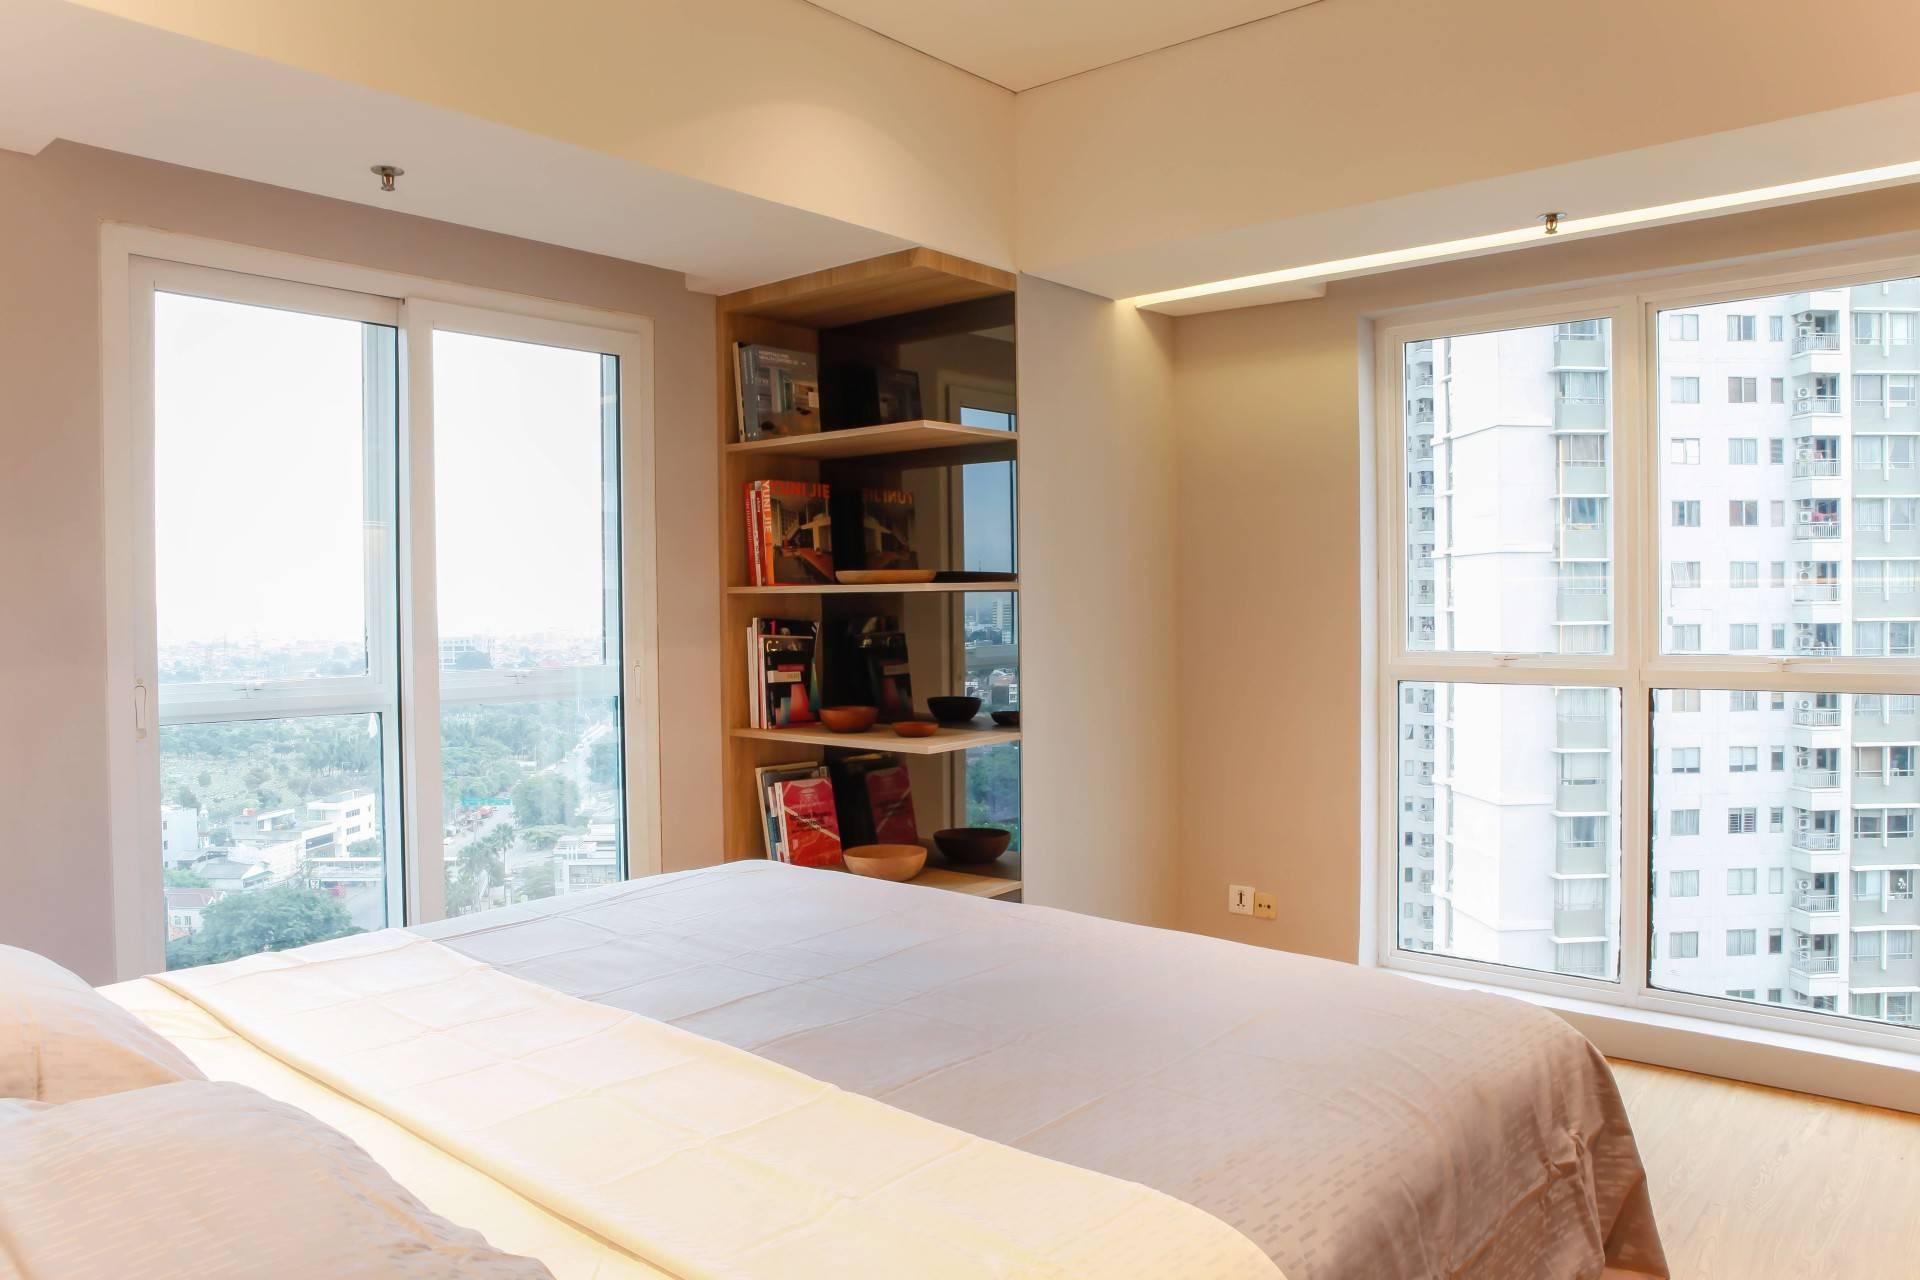 Design Intervention Pavilion Apartment At Kh Mas Mansyur Jakarta Jakarta Bedroom Minimalis,modern,industrial,glass  2588